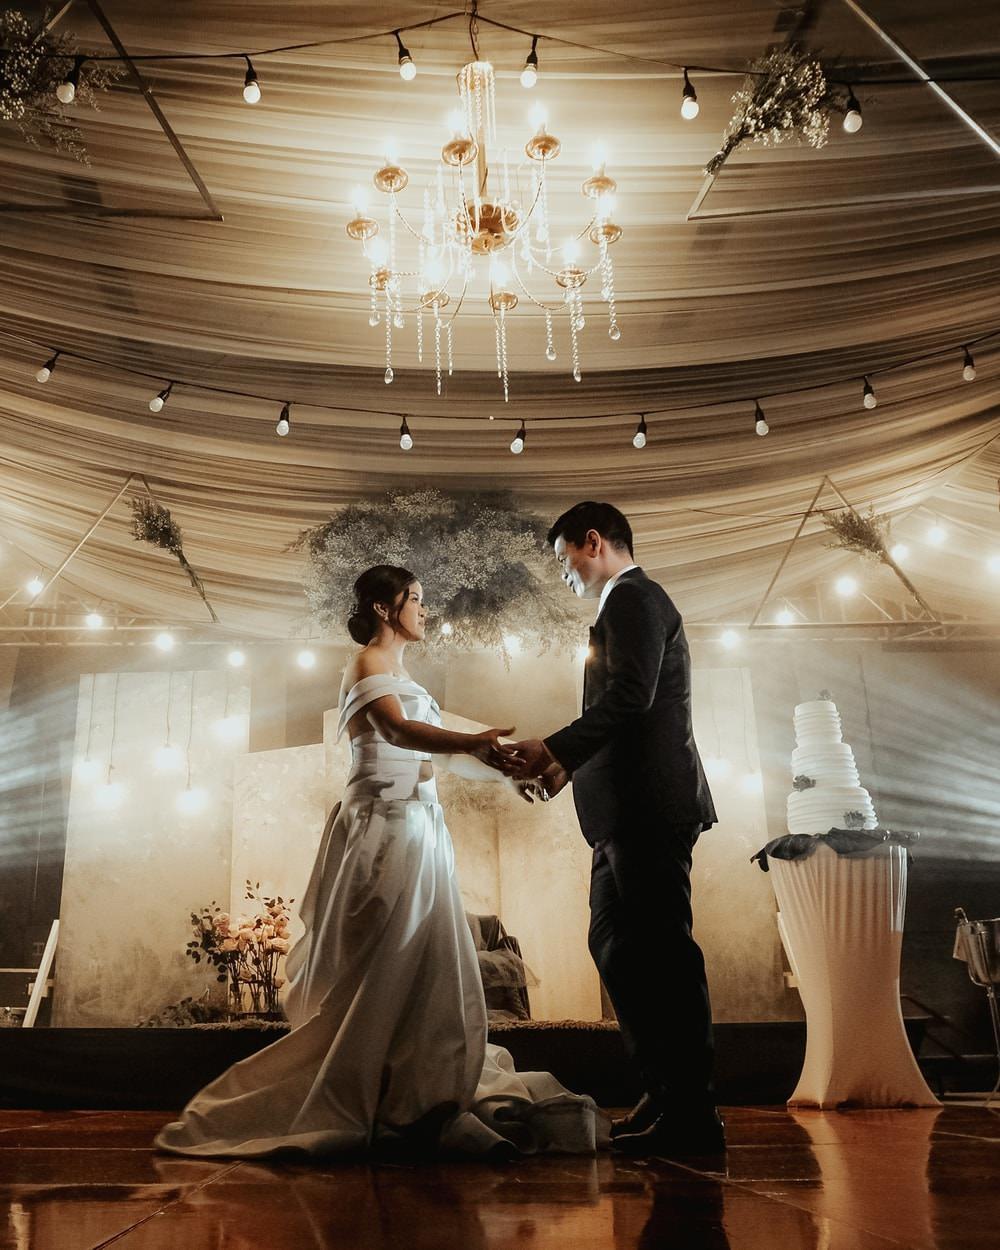 First Dance Lights Lighting Philippines Wedding The Backyard Studios